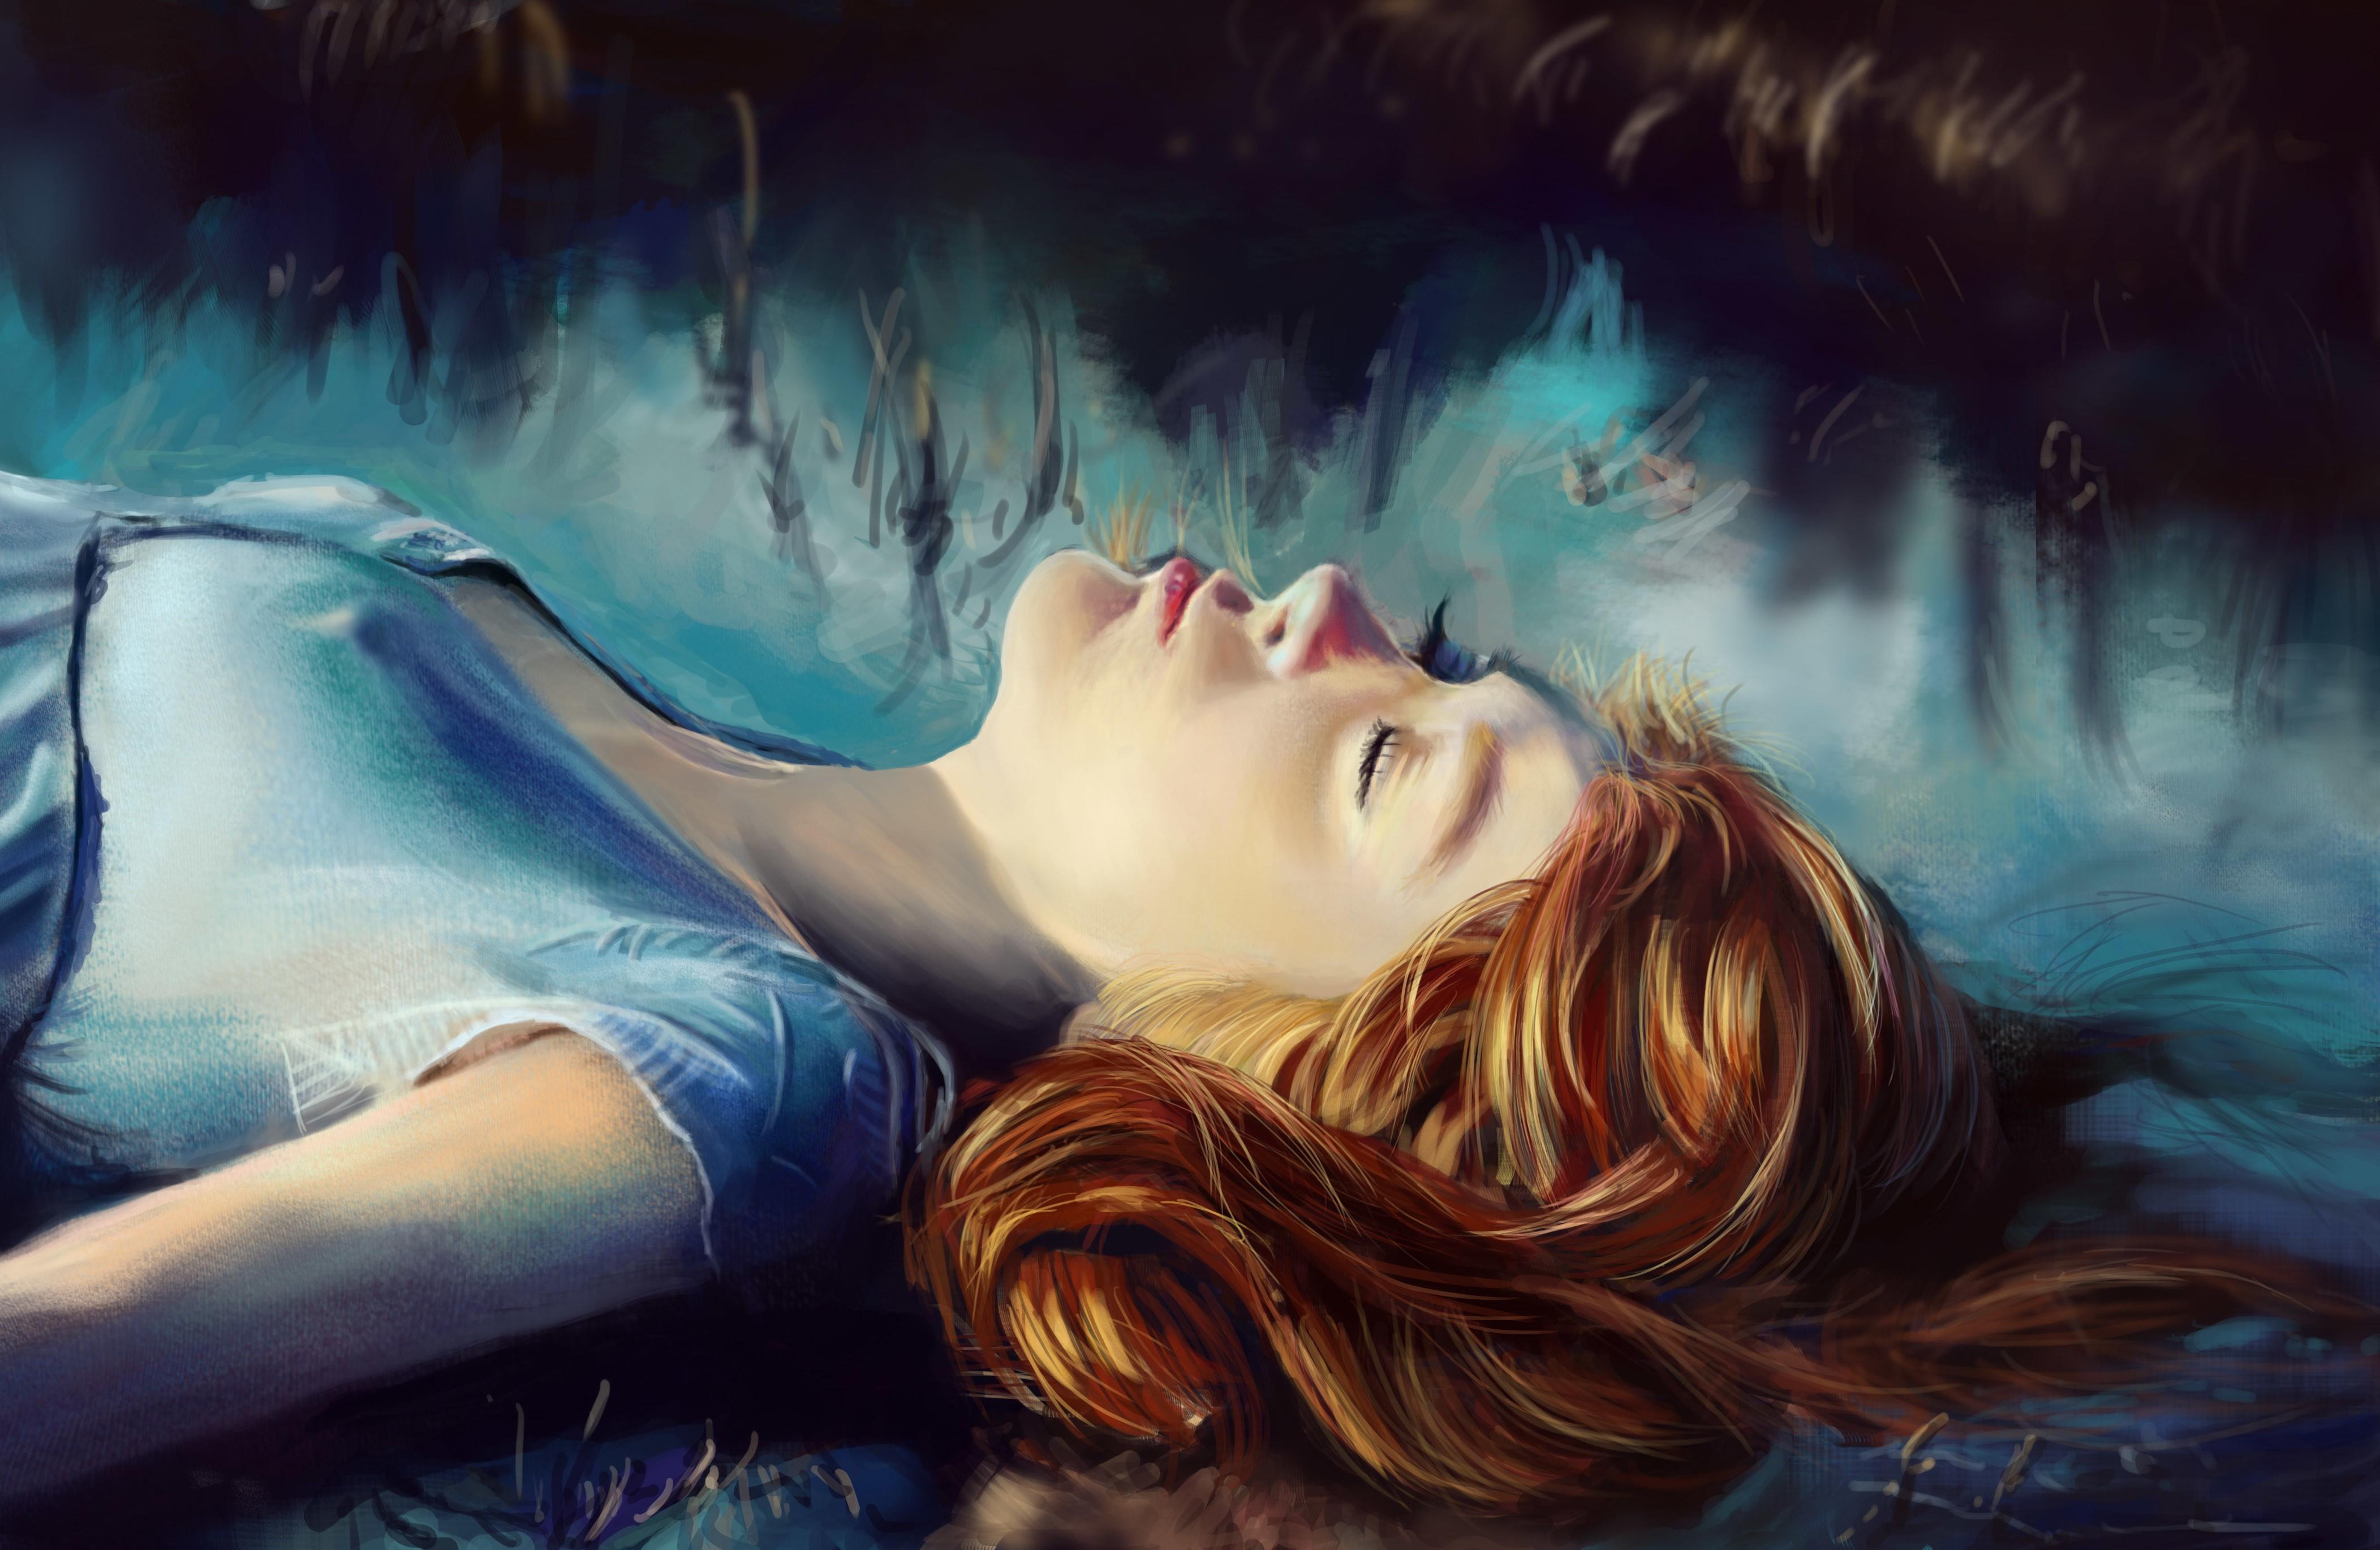 General 4207x2739 artwork women closed eyes nipples face sleeping lying on back